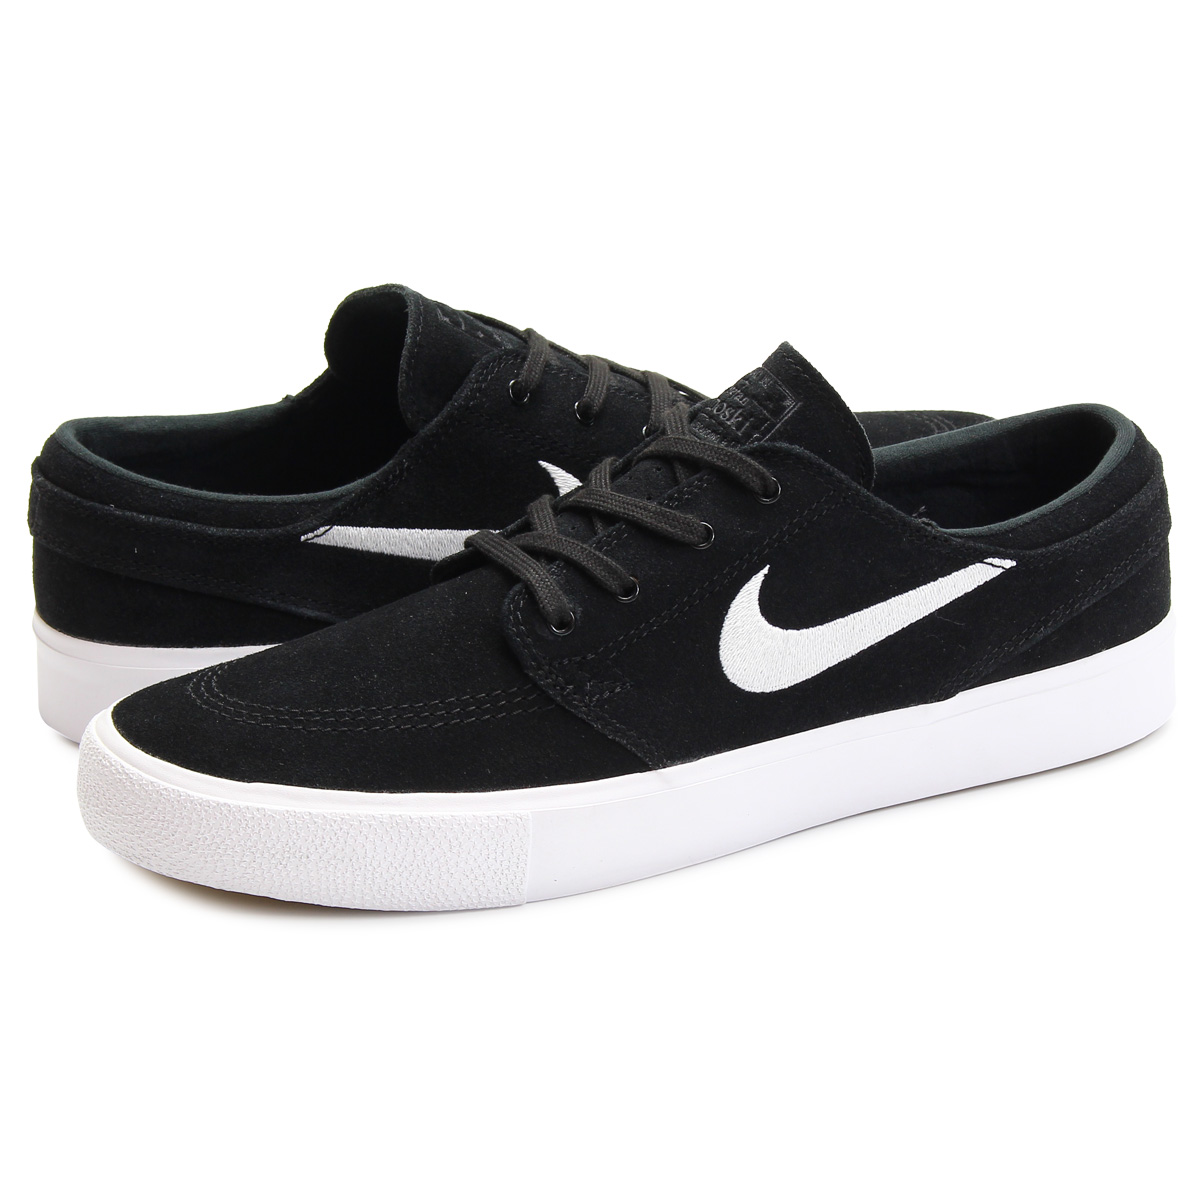 Nike NIKE SB ステファンジャノスキースニーカーメンズ ZOOM STEFAN JANOSKI RM black black AQ7475 001